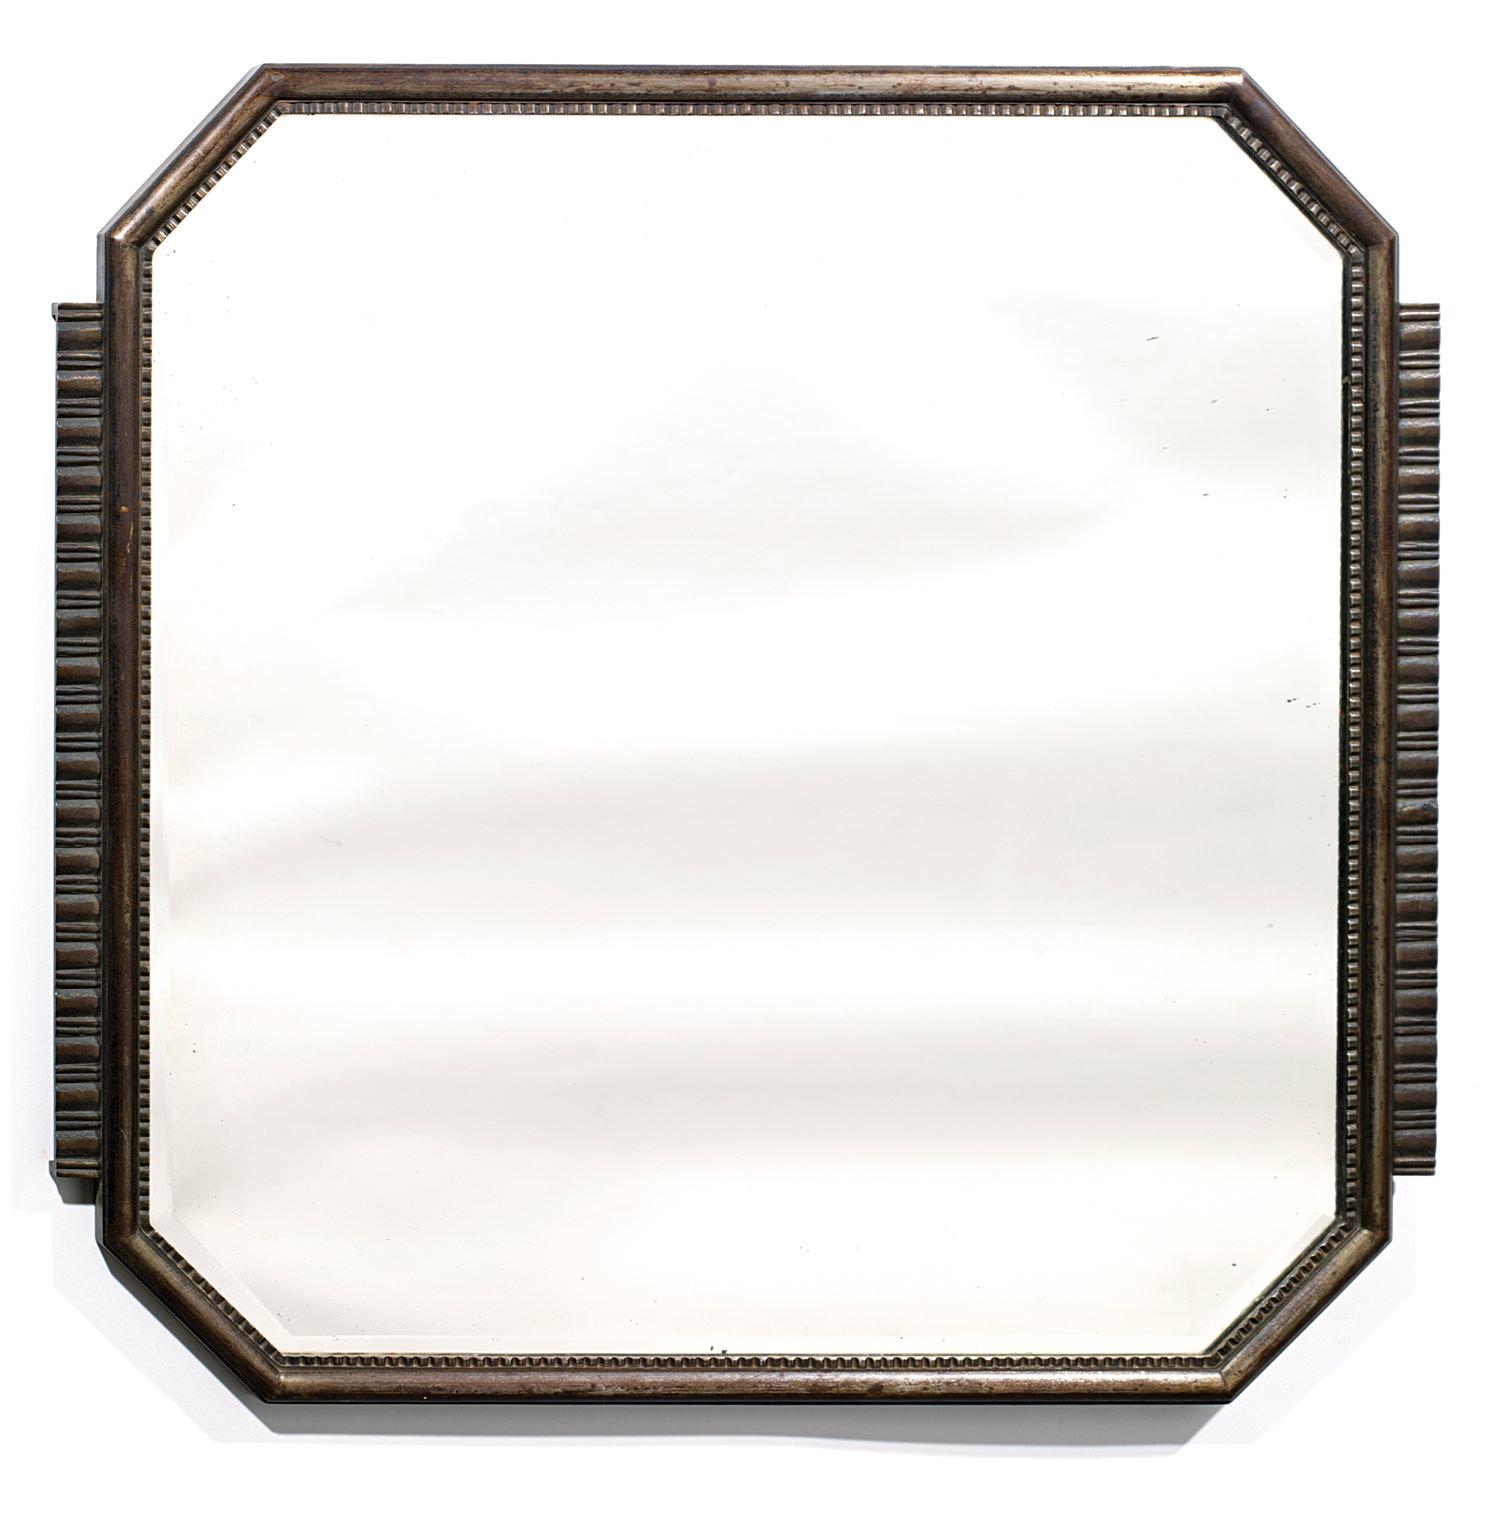 Edgar Brandt (1880-1960) Wrought Iron Art Deco Mirror, Tajan Paris